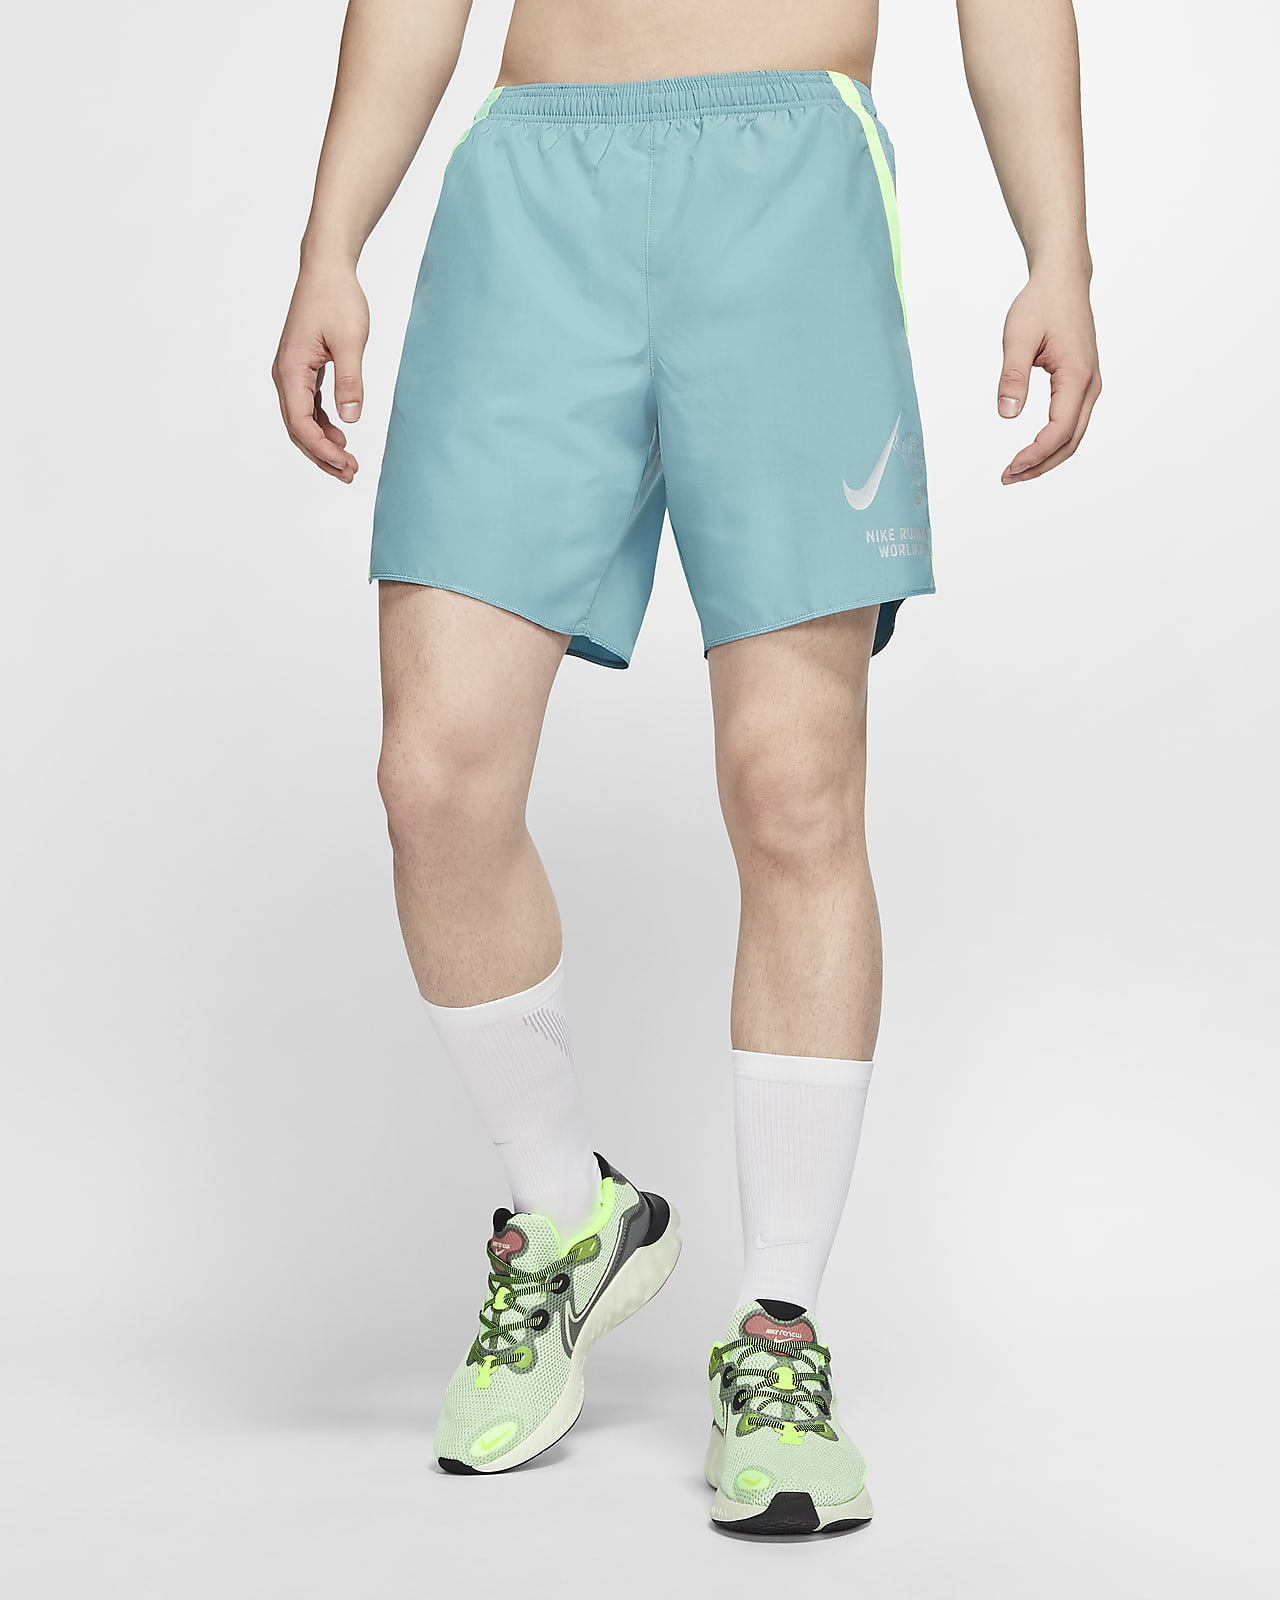 Nike Challenger Wild Run Men's 18cm (approx.) Brief-Lined Running Shorts